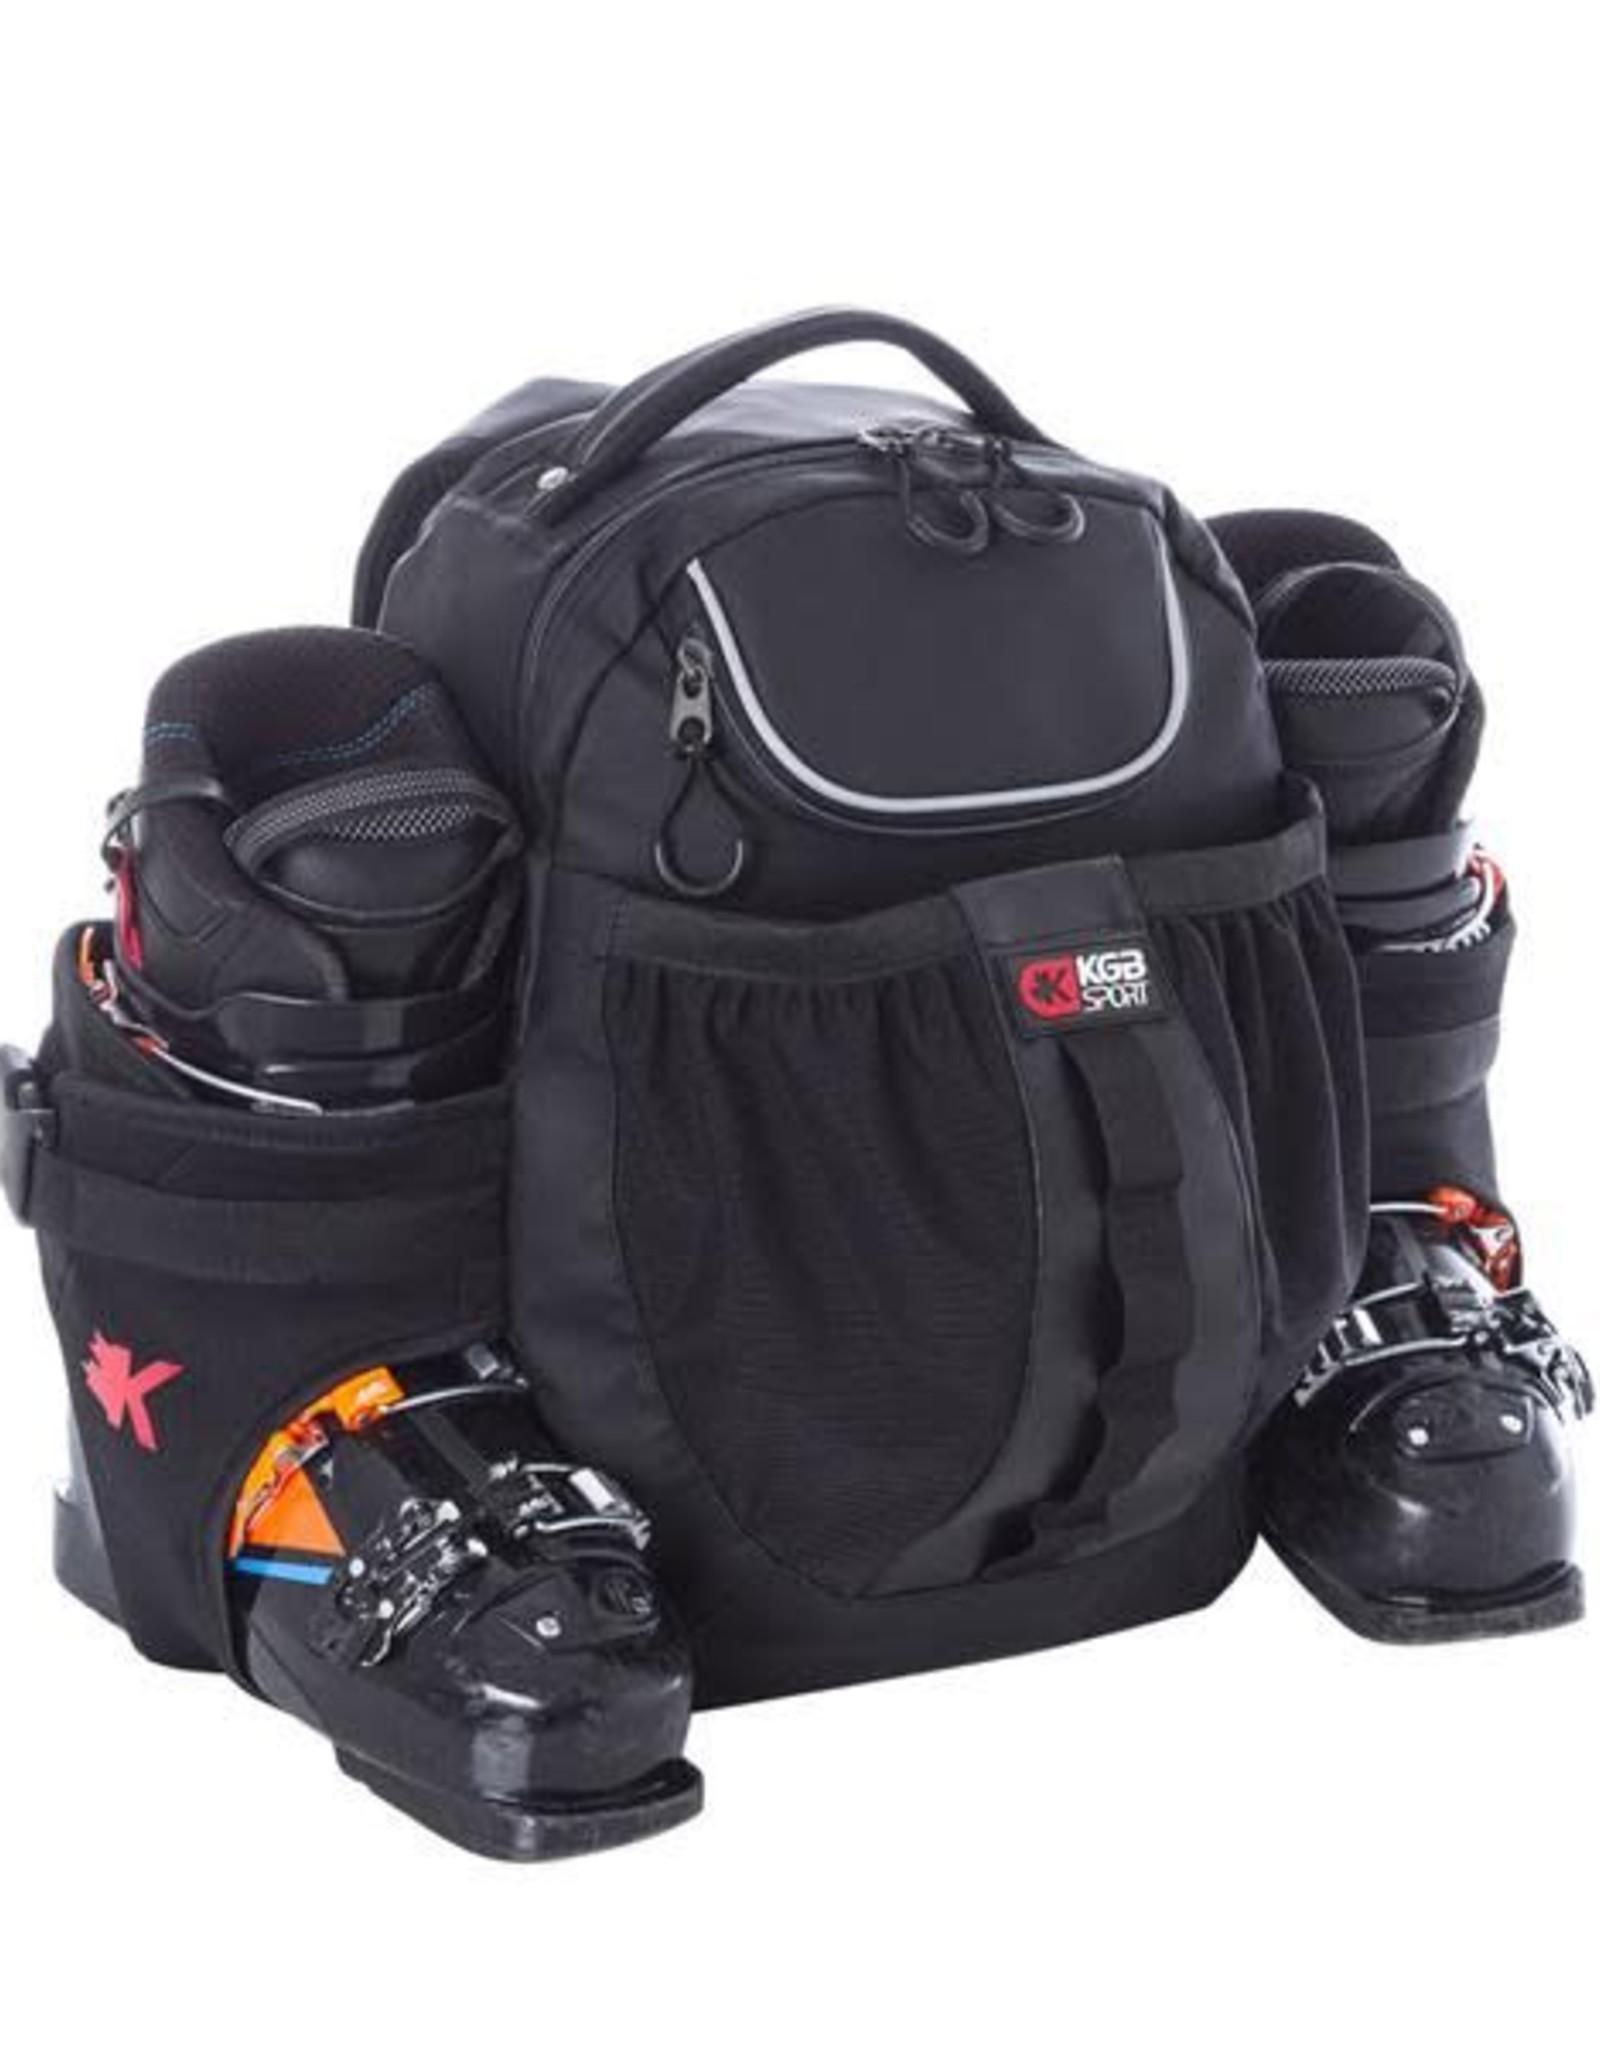 KGB K&B Junior expert boot bag